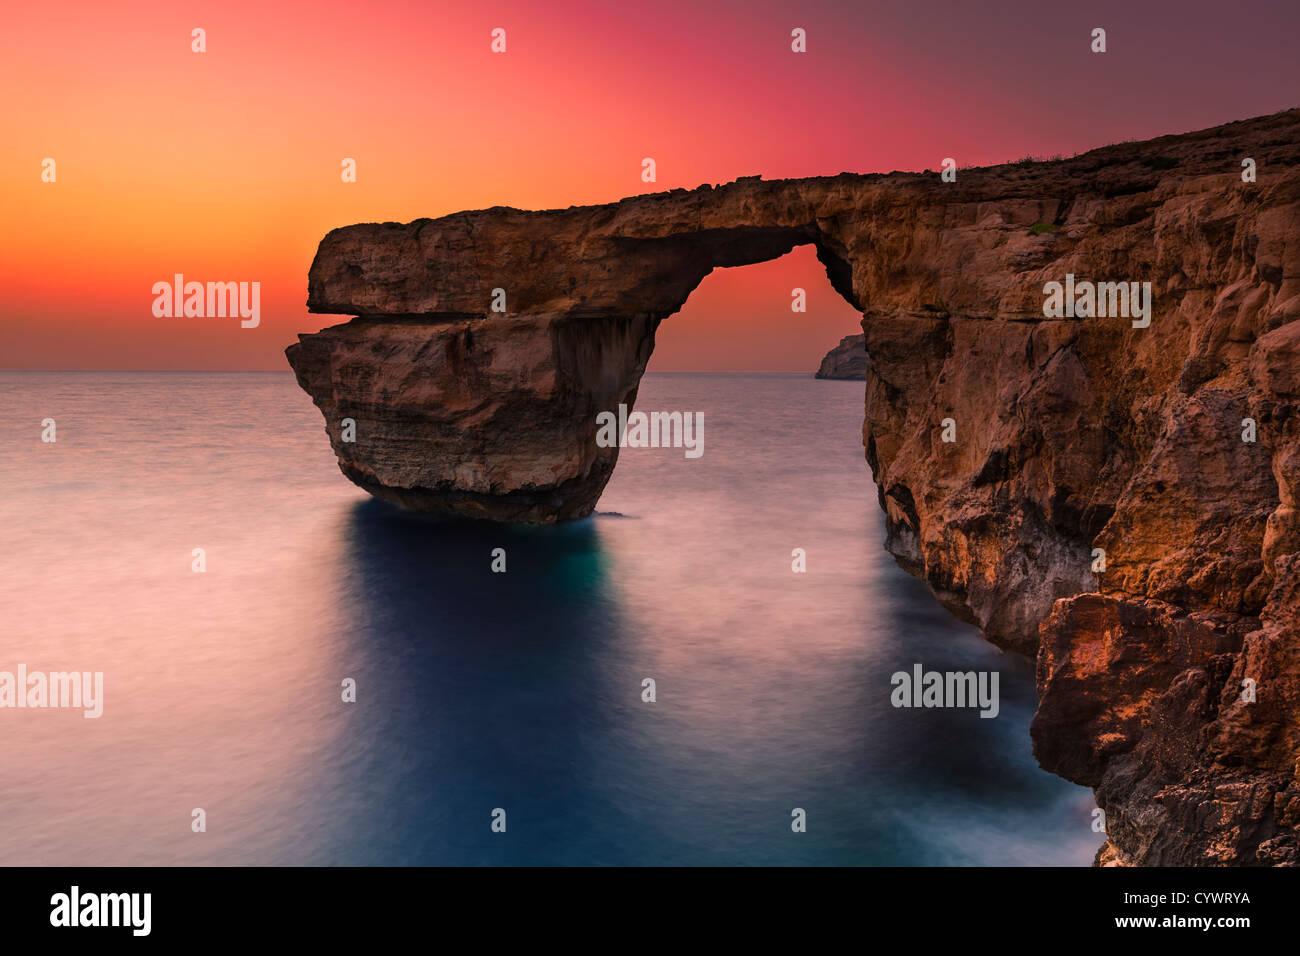 The Azure Window on the coast of the Maltese island Gozo - Stock Image